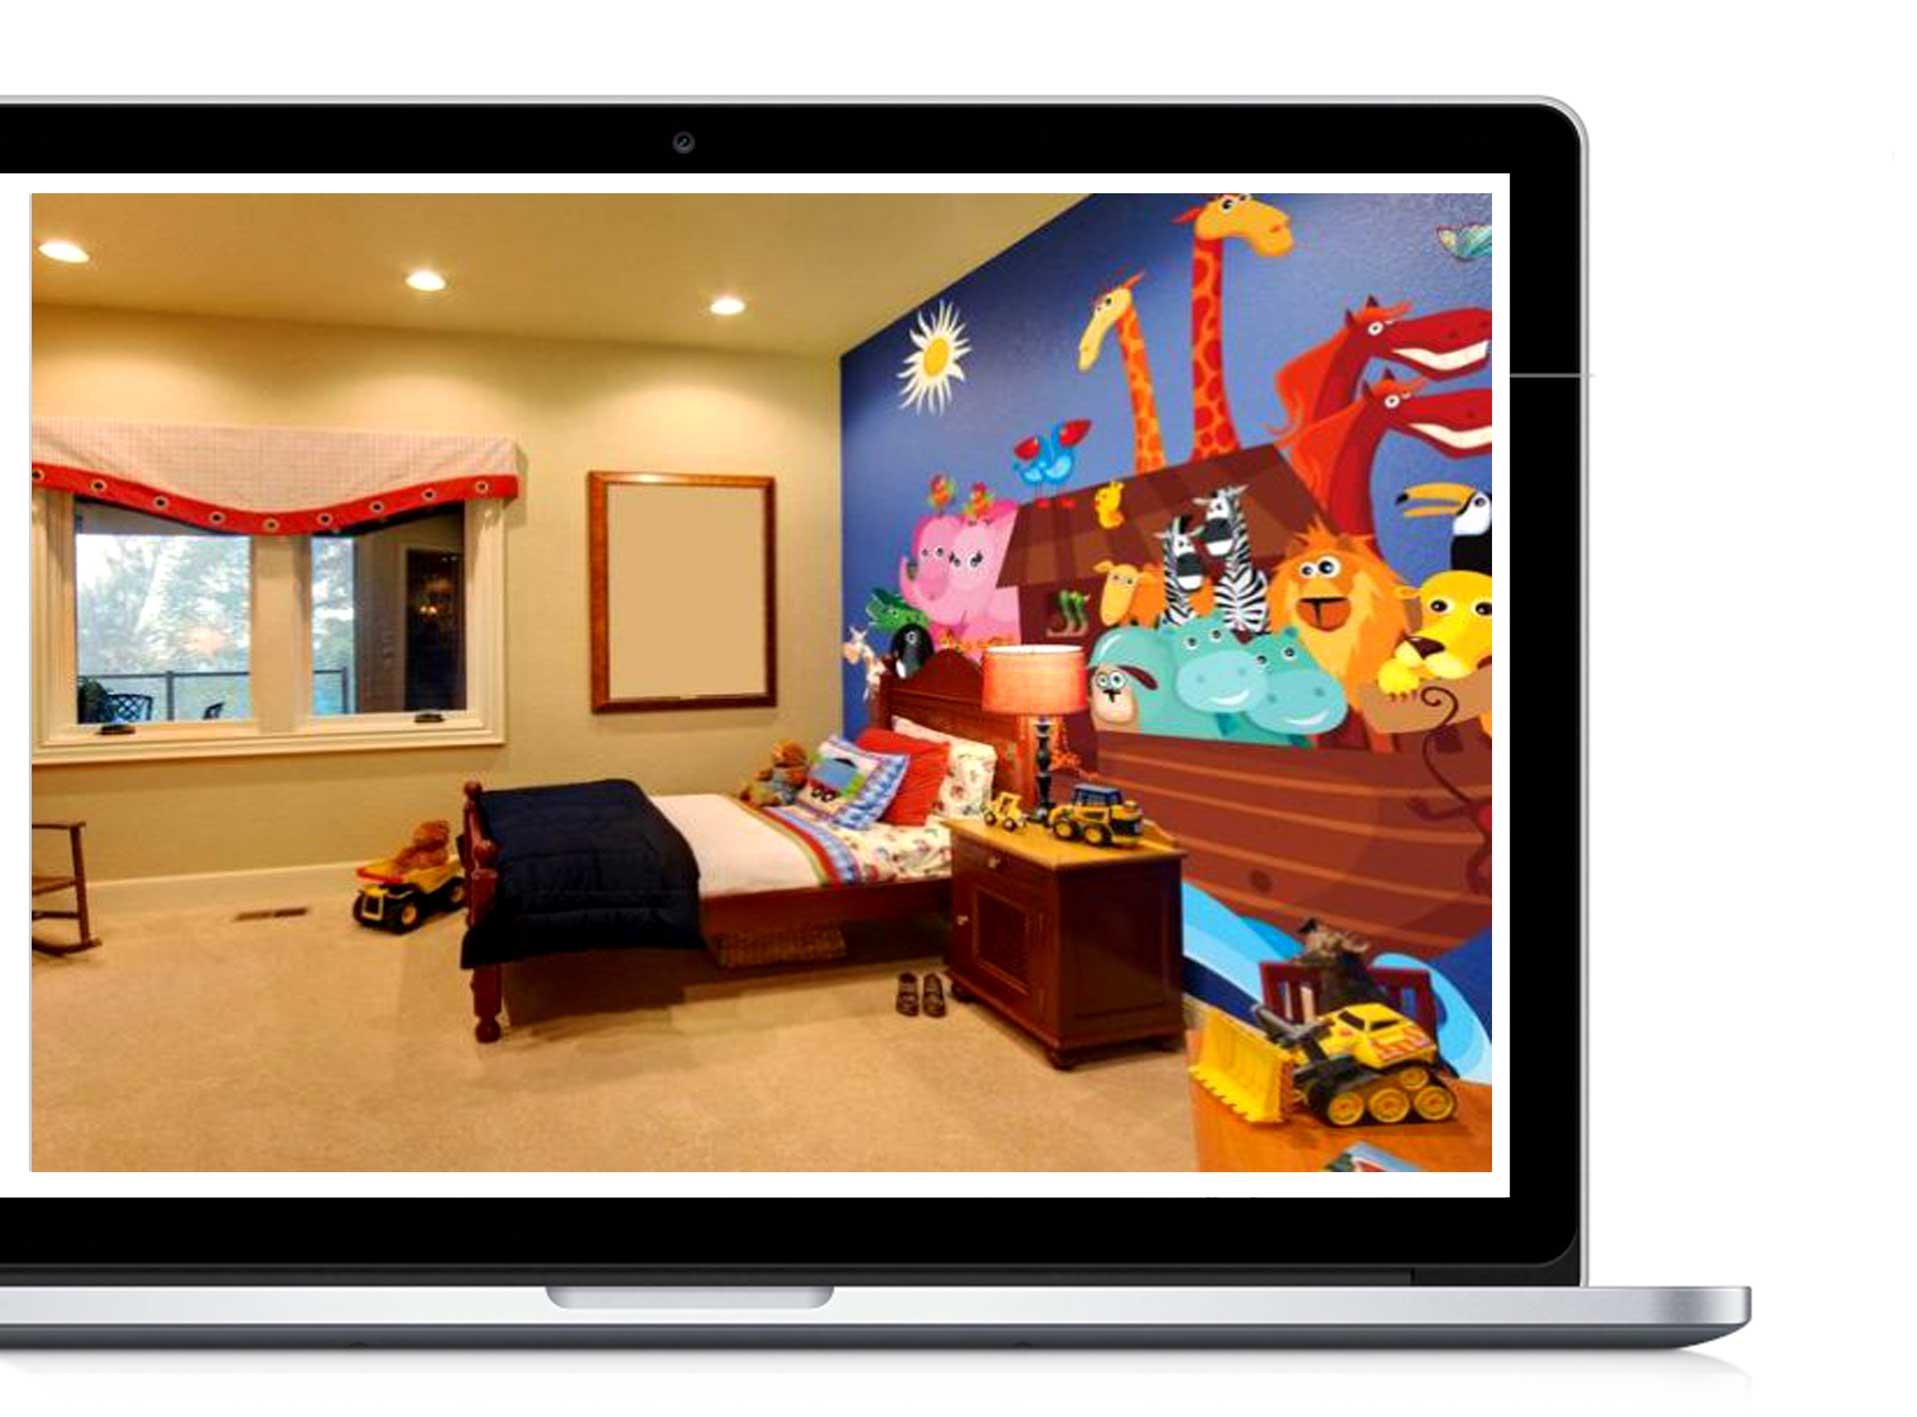 Yellow kids study room 32 - دکوراسیون داخلی- اتاق کودک